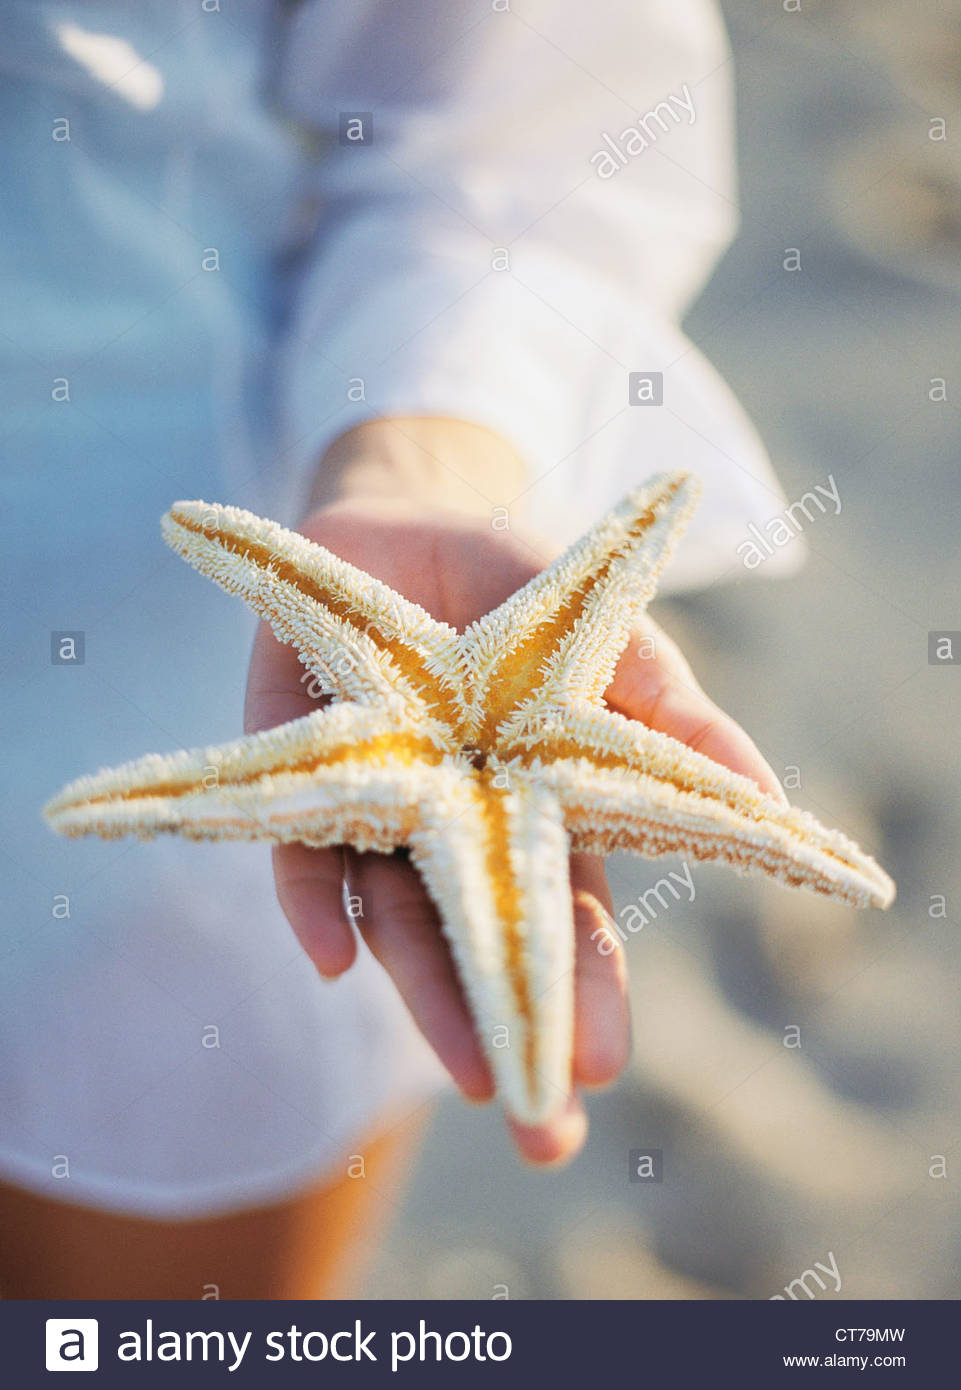 Starfish Anatomy Stock Photos Starfish Anatomy Stock Images Alamy